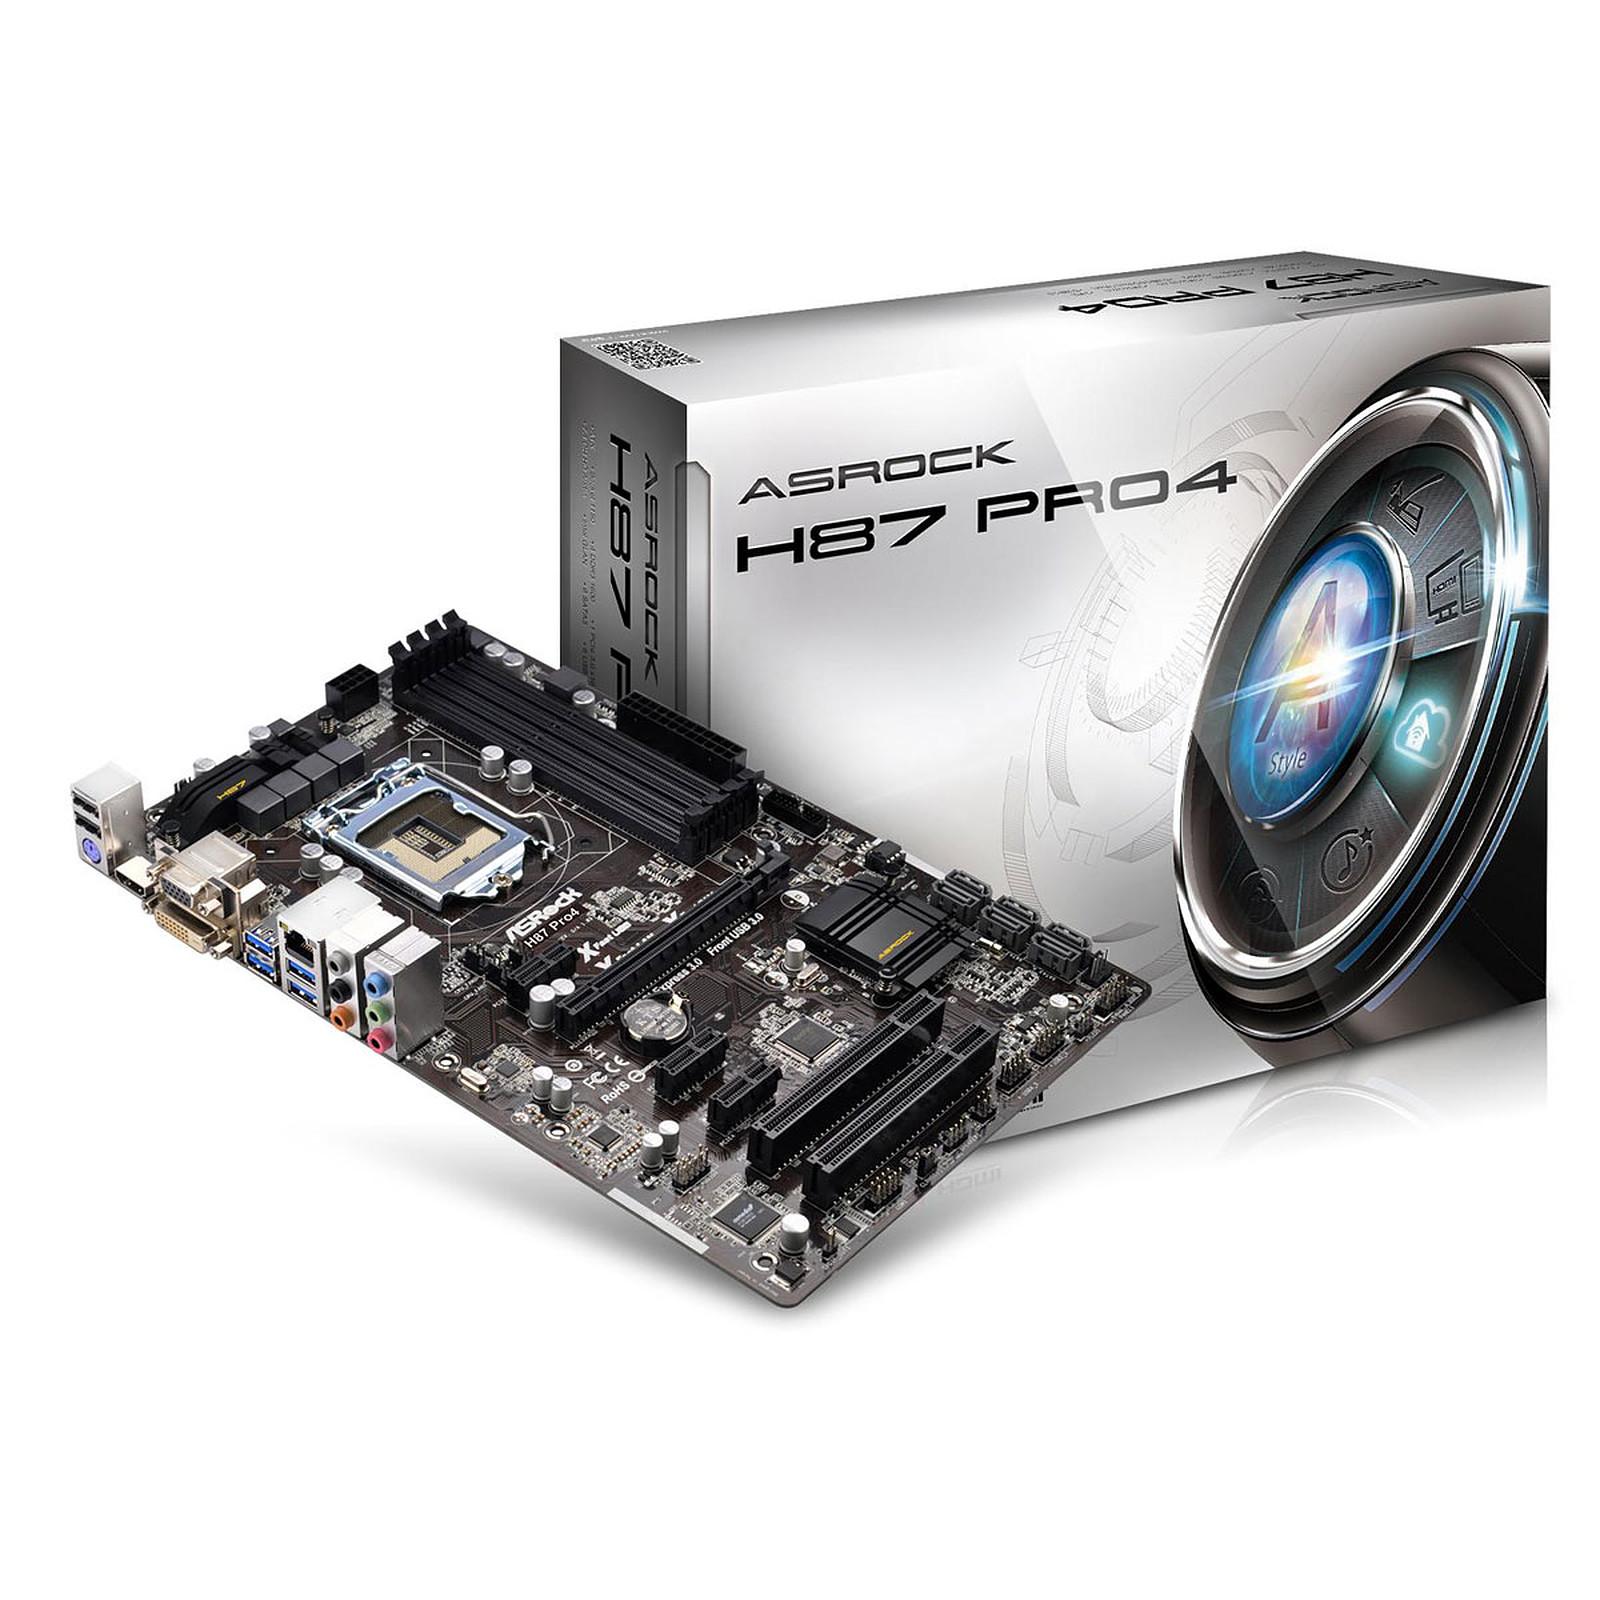 ASRock H87 Pro4